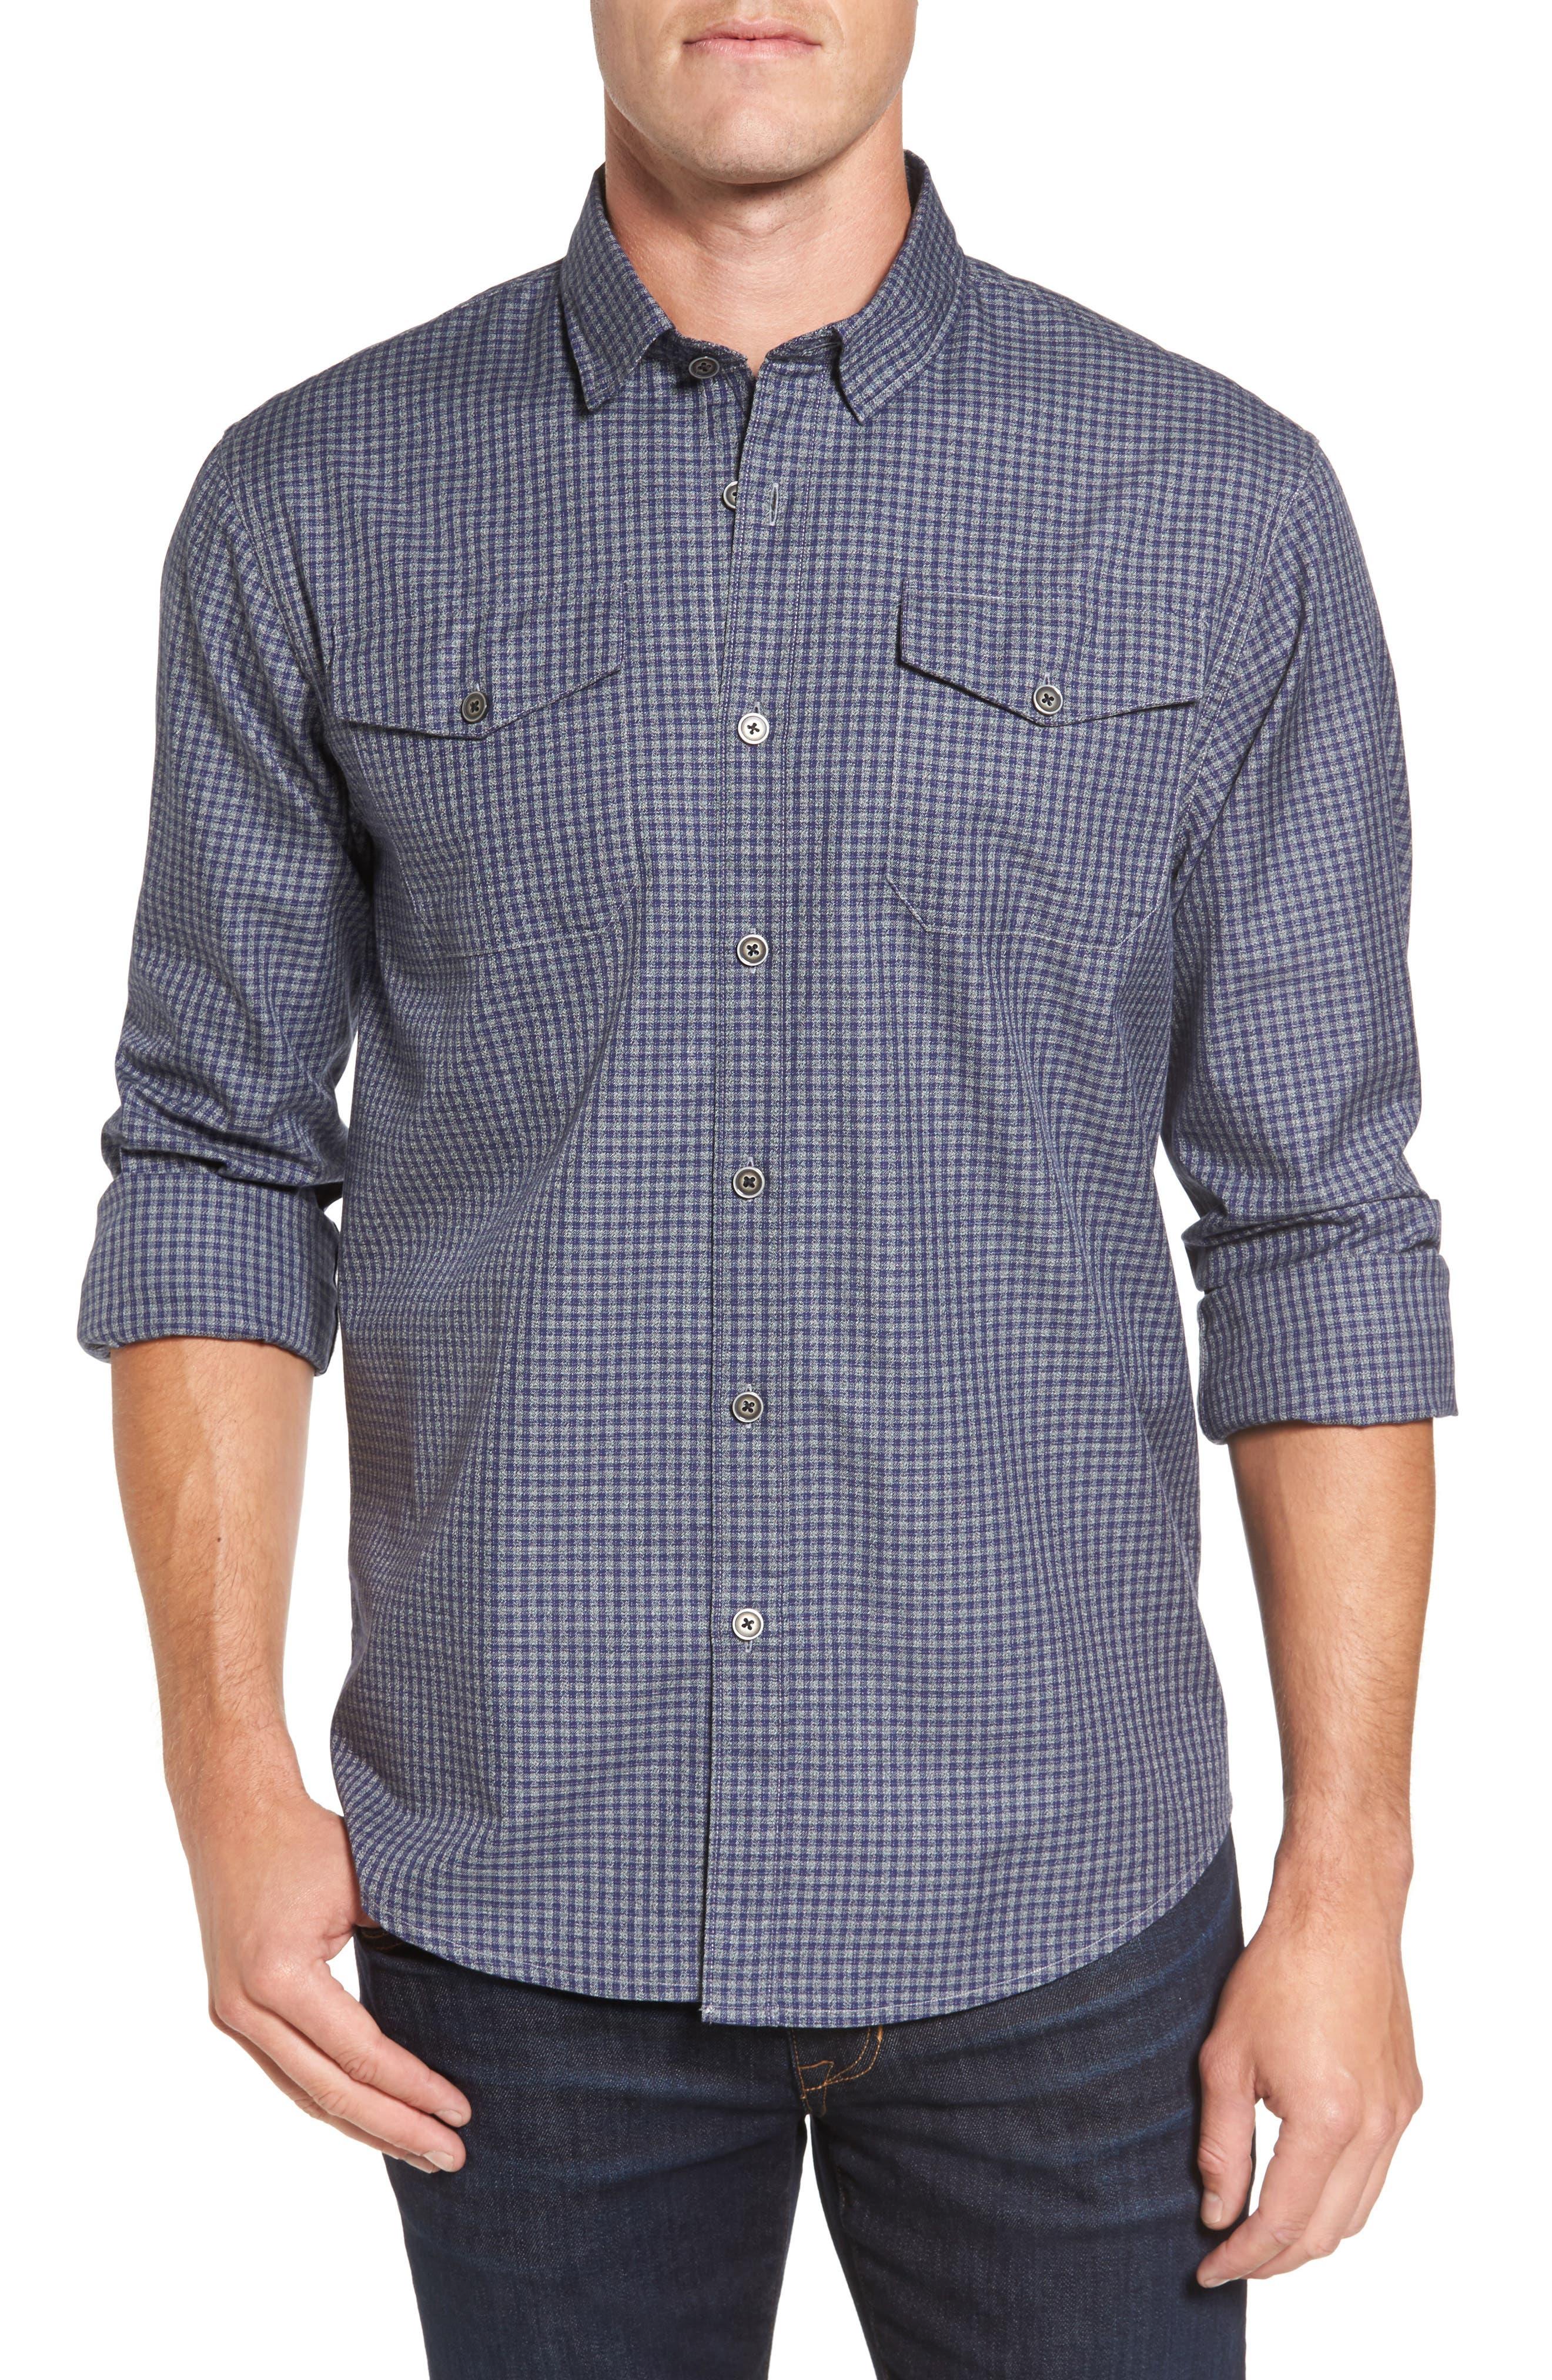 Main Street Check Flannel Shirt,                         Main,                         color, 405